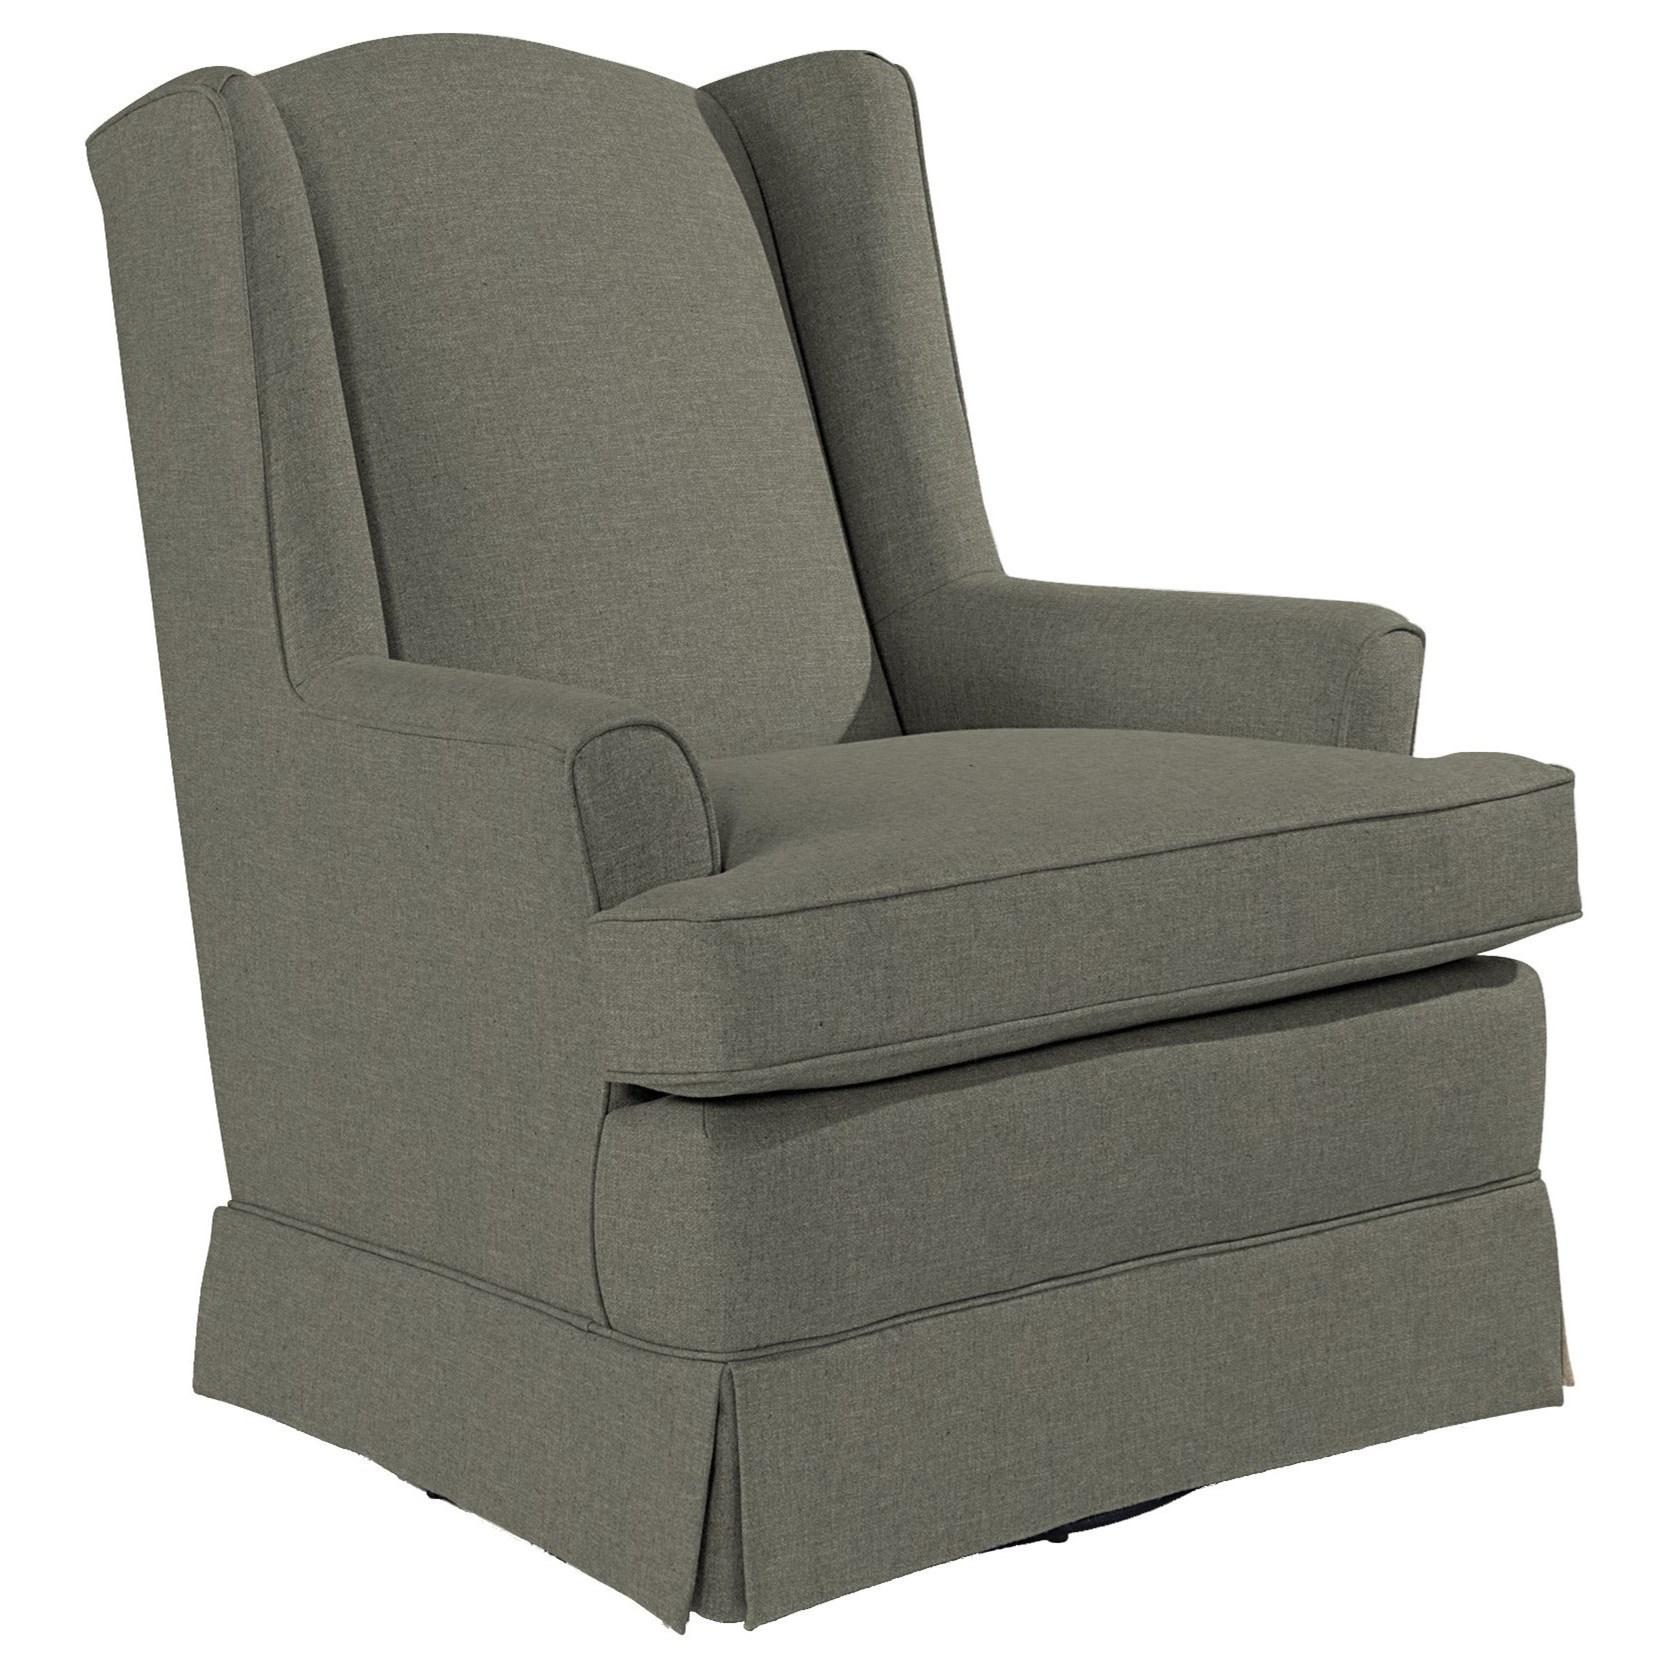 Swivel Glide Chairs Natasha Swivel Glider by Best Home Furnishings at Lucas Furniture & Mattress